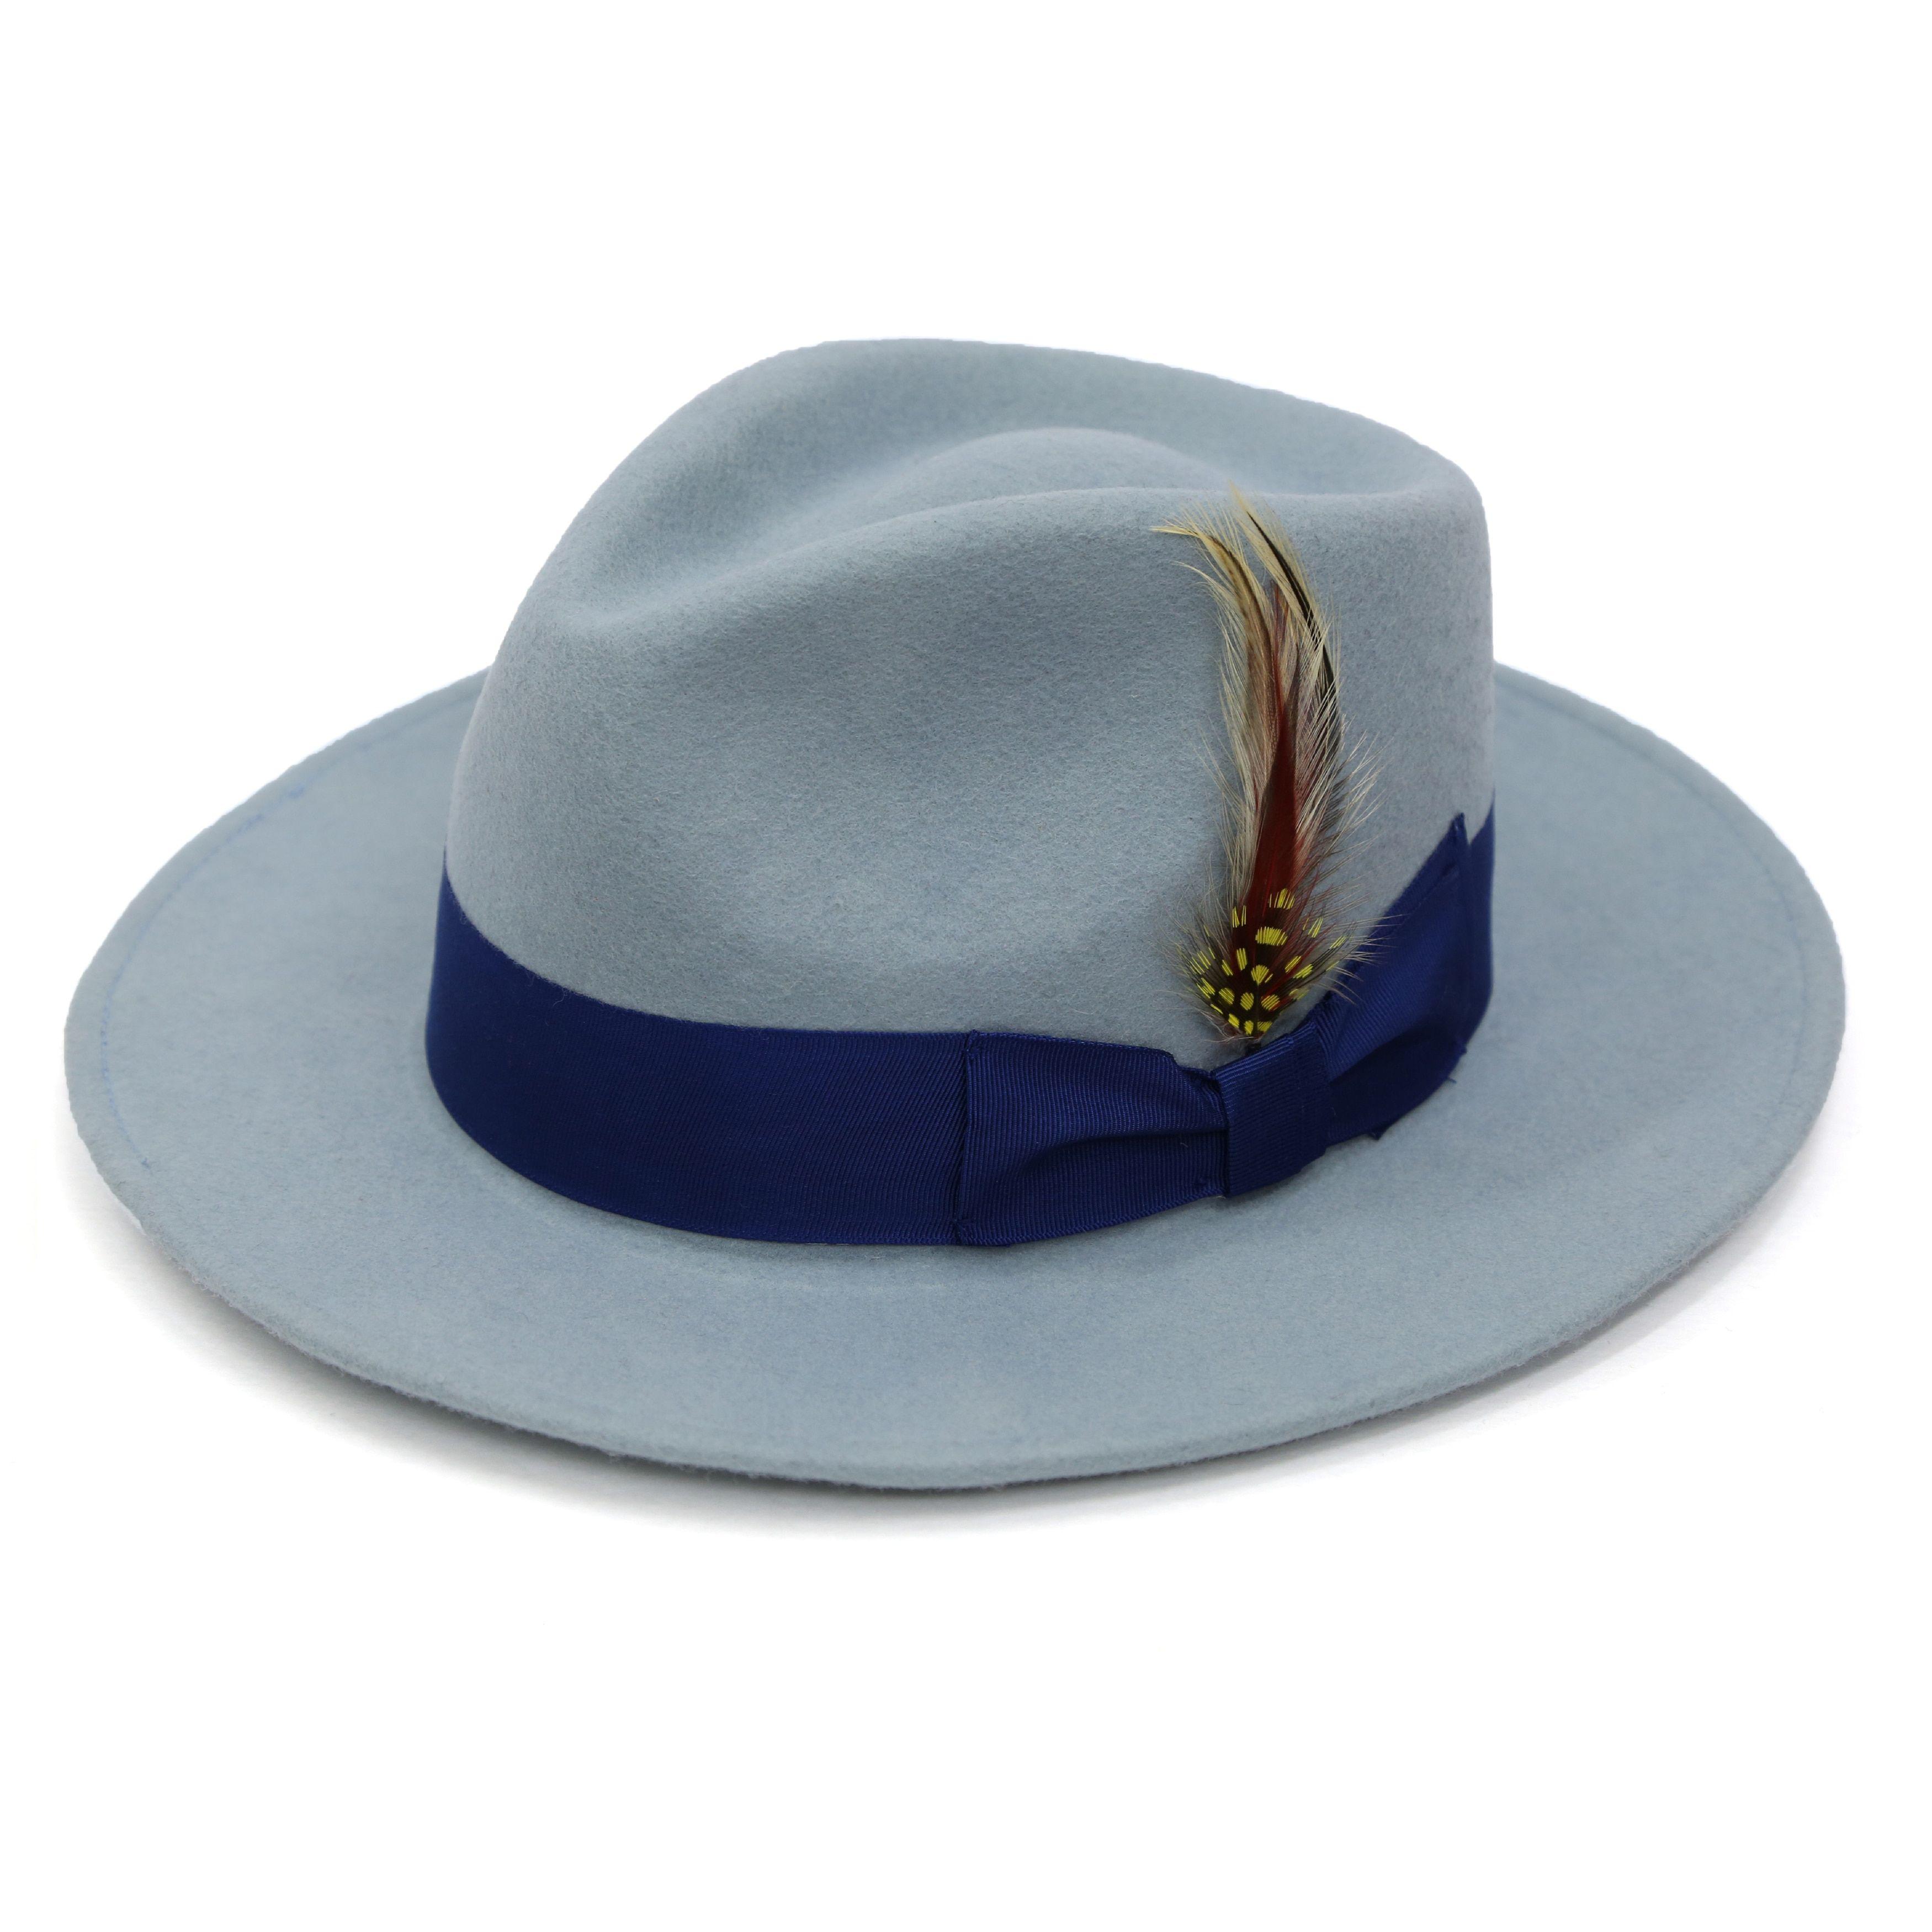 467ec8b9836e0 Ferrecci Men s Sky Blue Lined Wool Royal Blue Band Fedora Hat